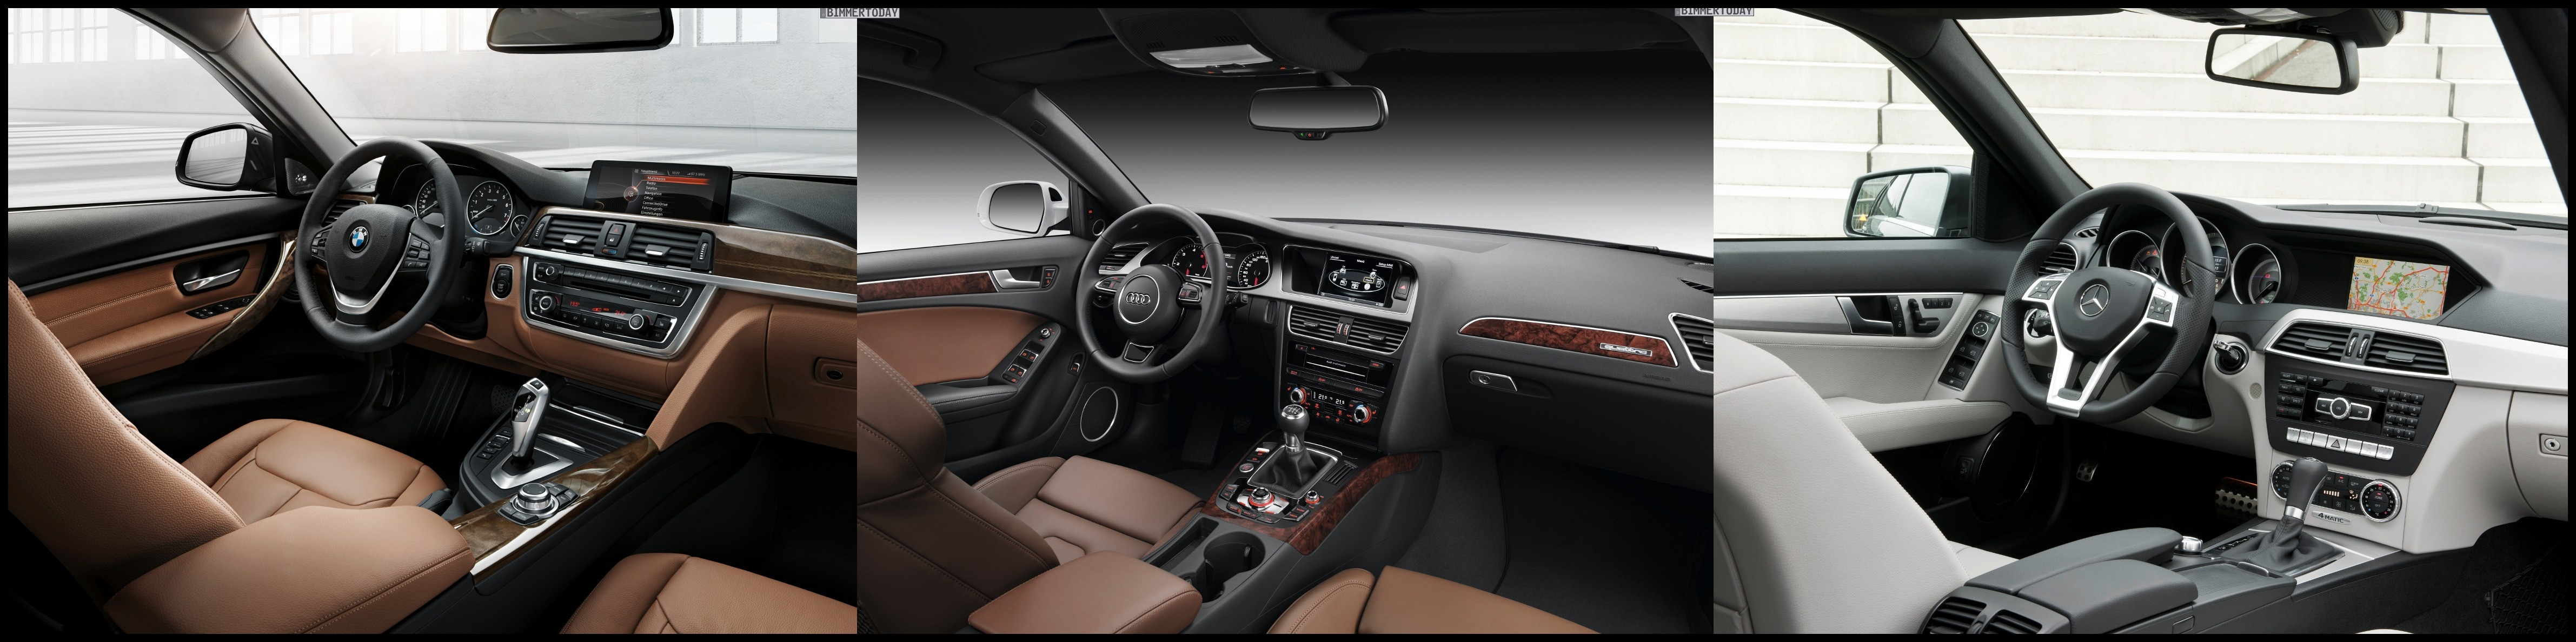 Audi A4 Vs Bmw 3 Series 2018 Lovely Parison New Bmw 3 Series touring Vs Audi